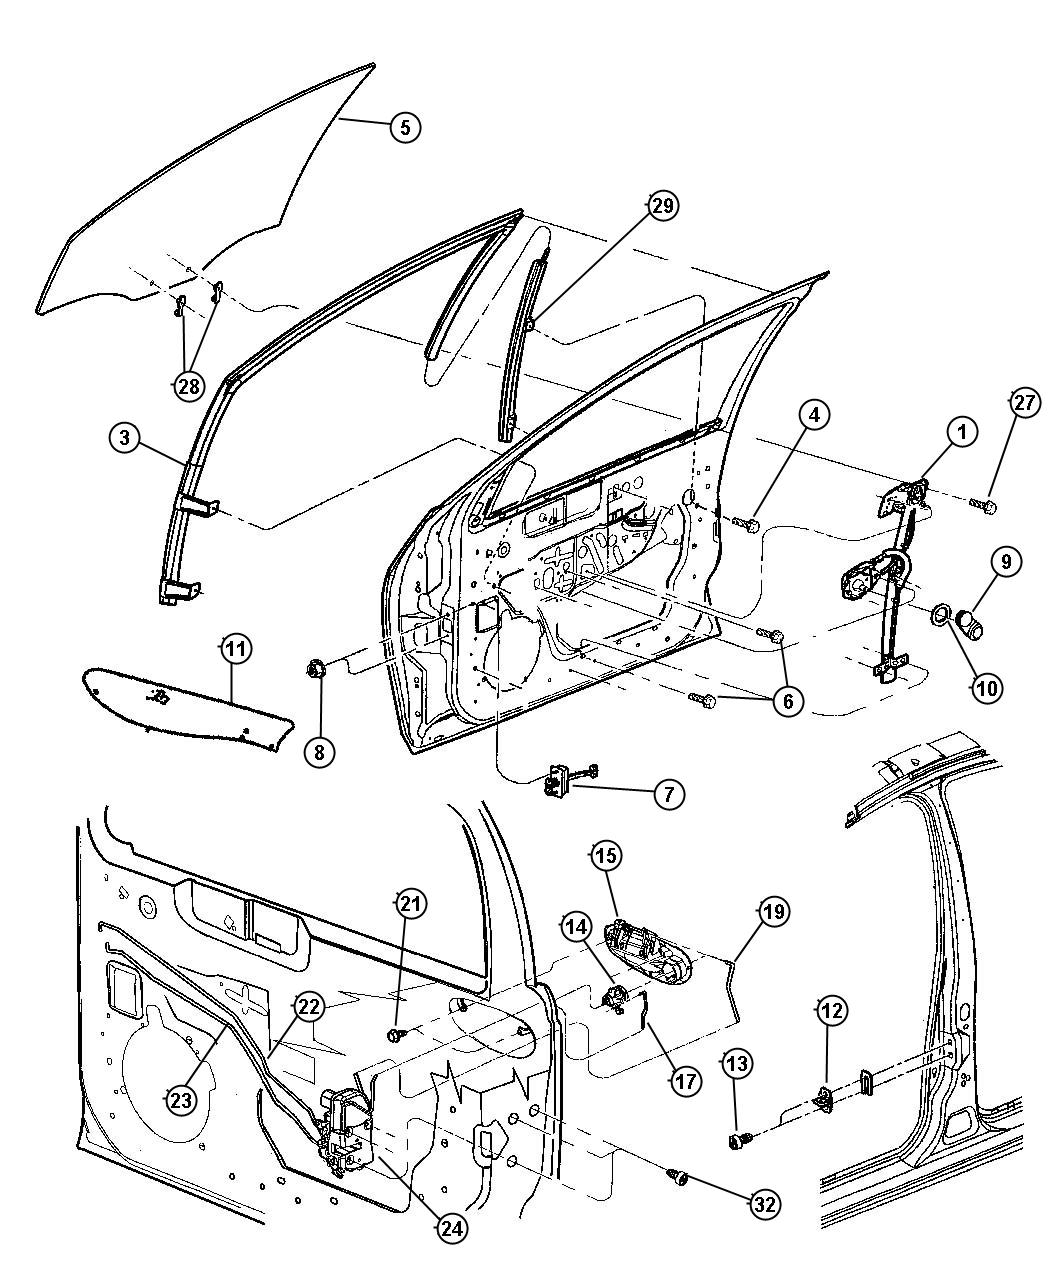 2002 dodge neon wiring diagram football x and o 2000 lotus esprit fuse panel auto box